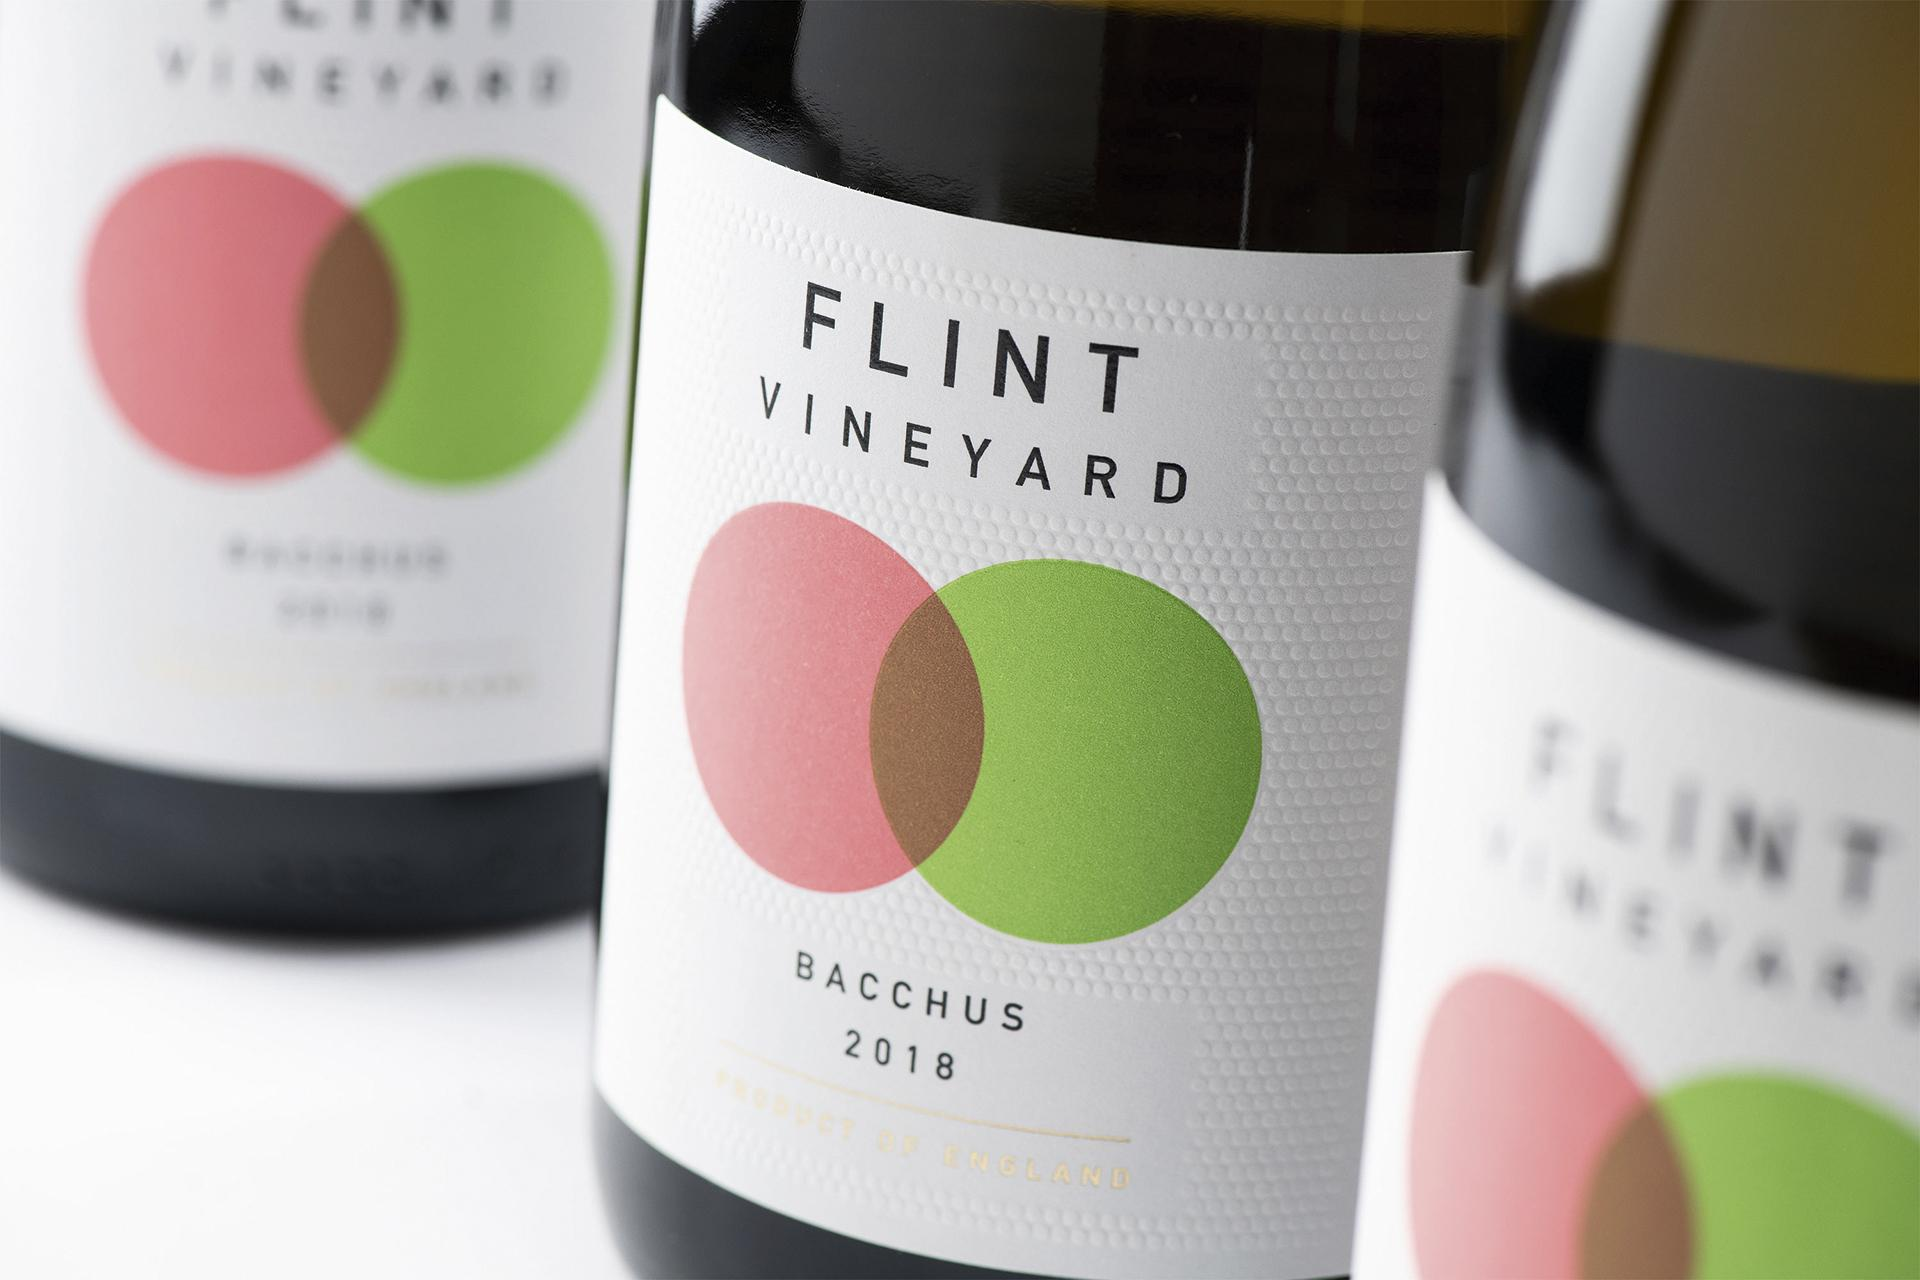 Flint Bacchus